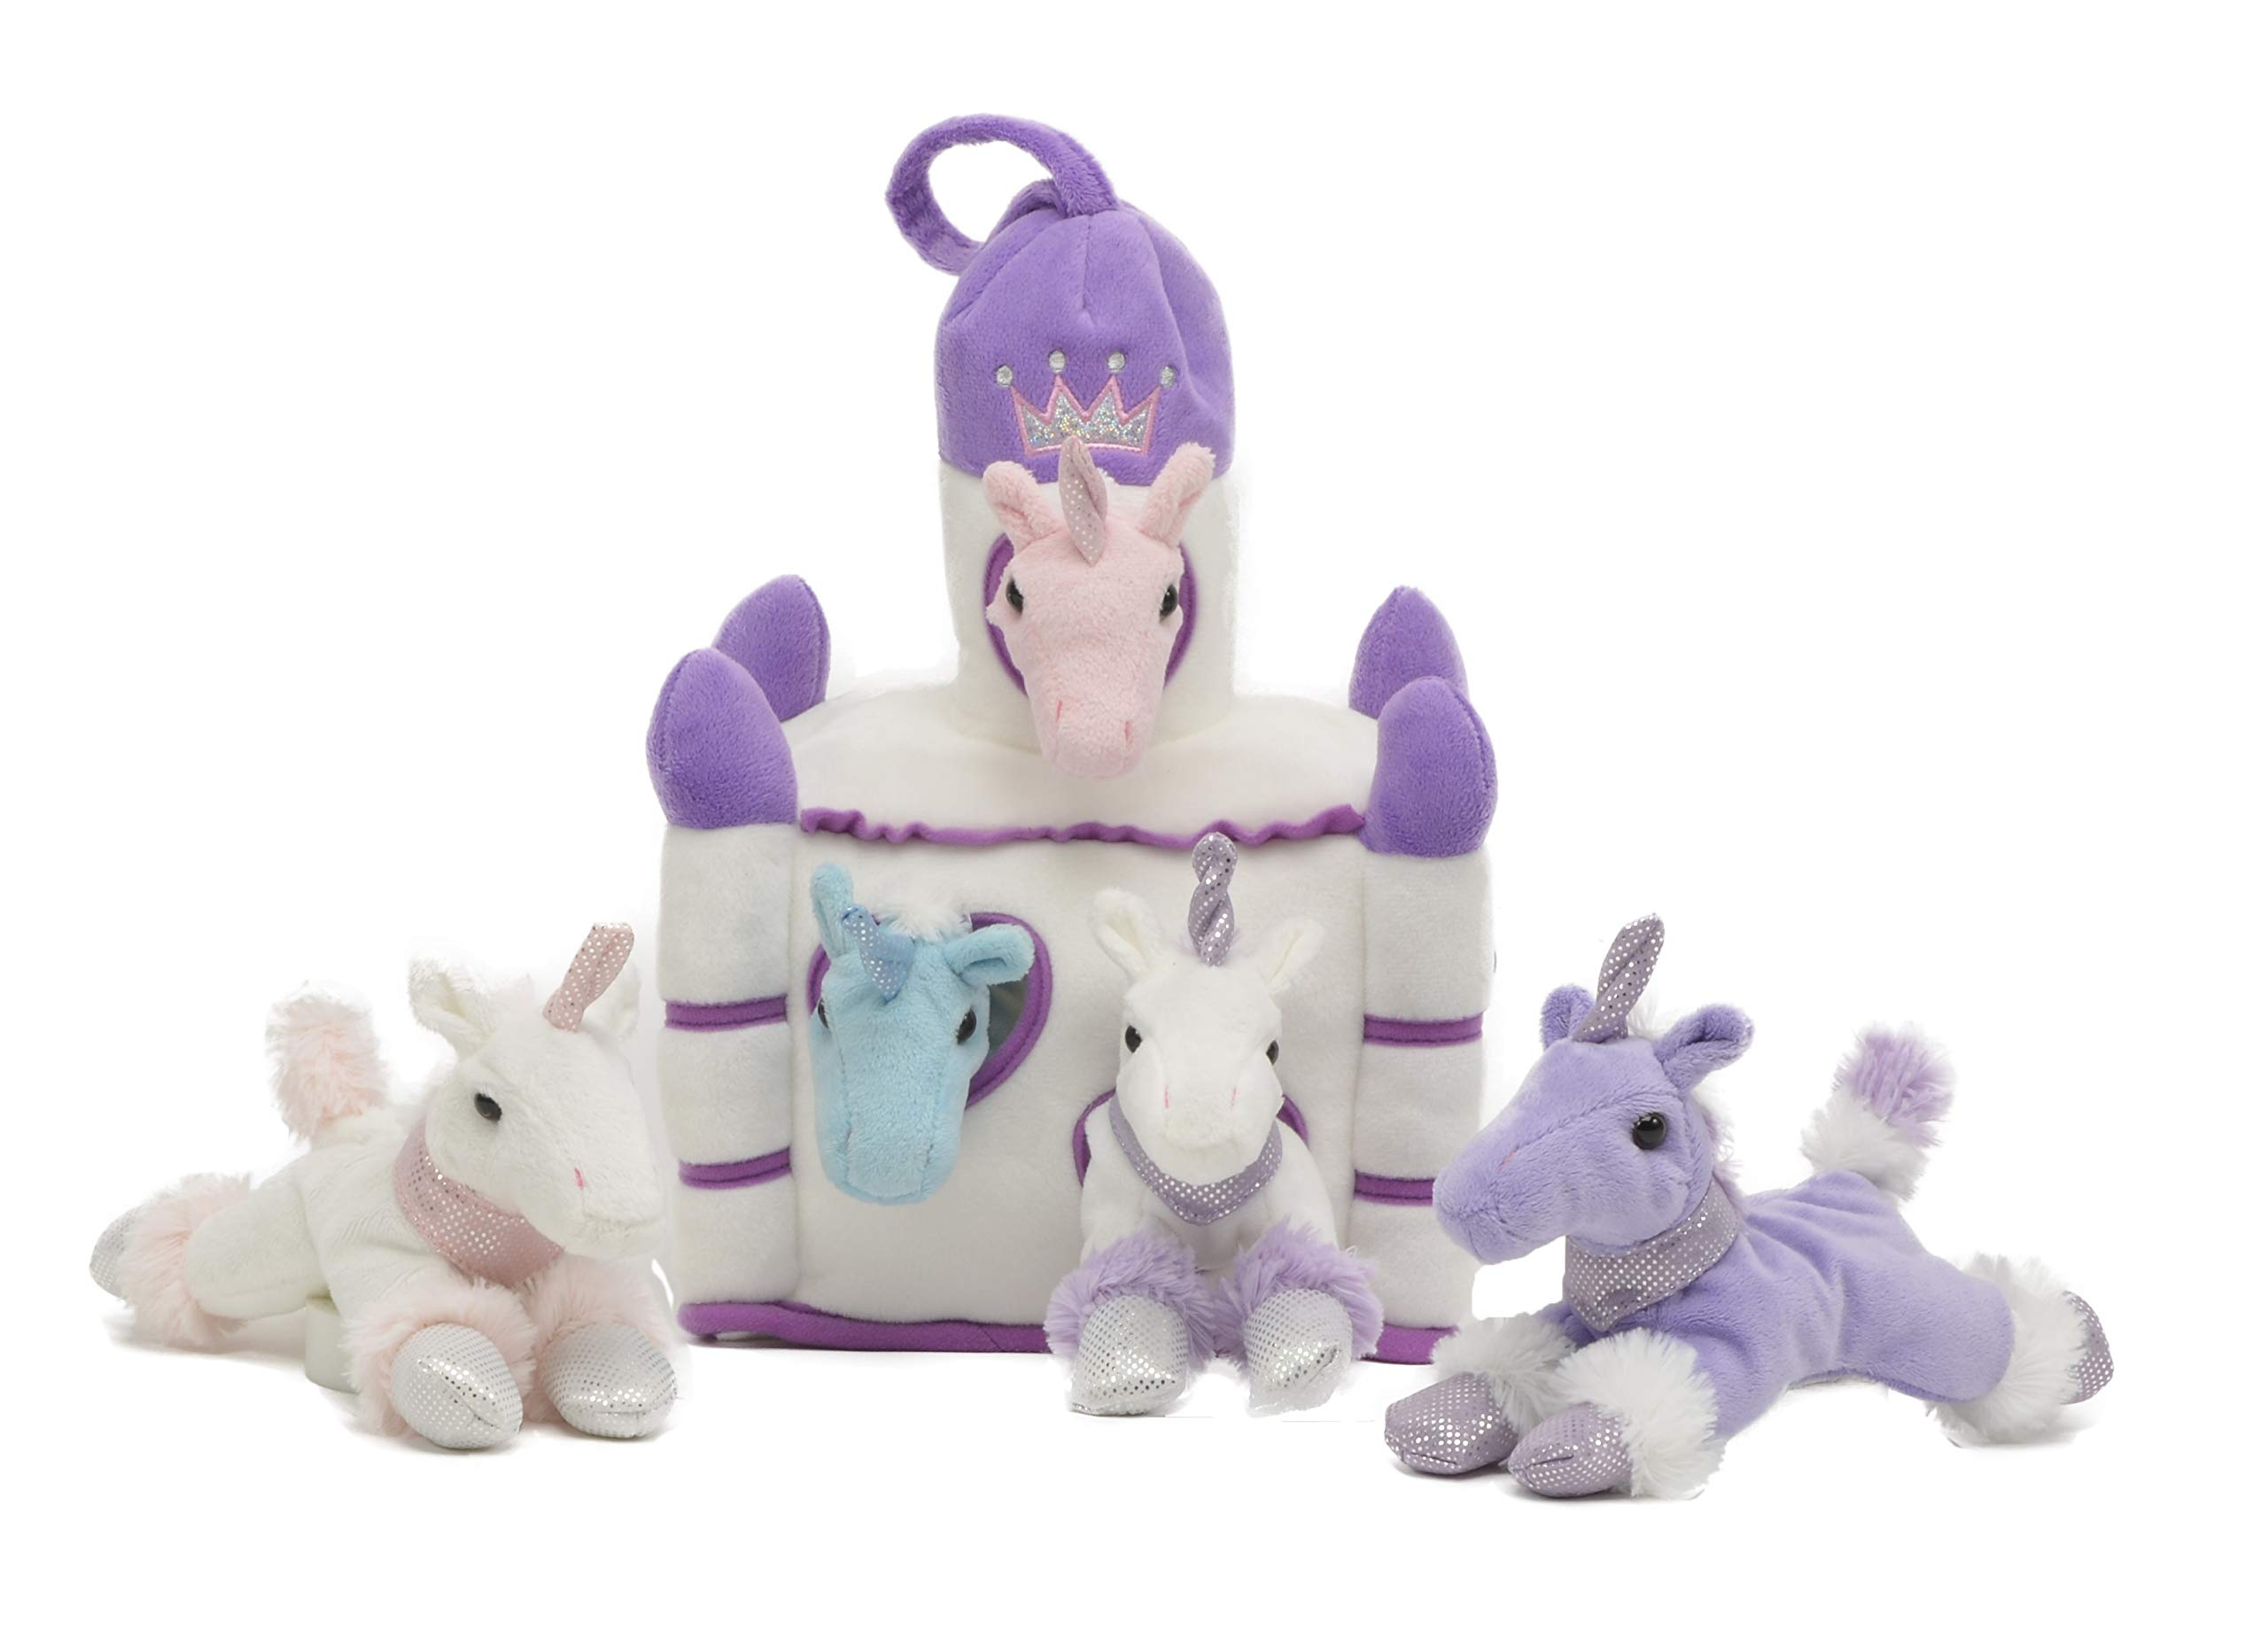 Unipak 12'' Plush Castle - 5 Stuffed Animals in a Castle Carrying Case (Unicorns Purple Castle) by Unipak